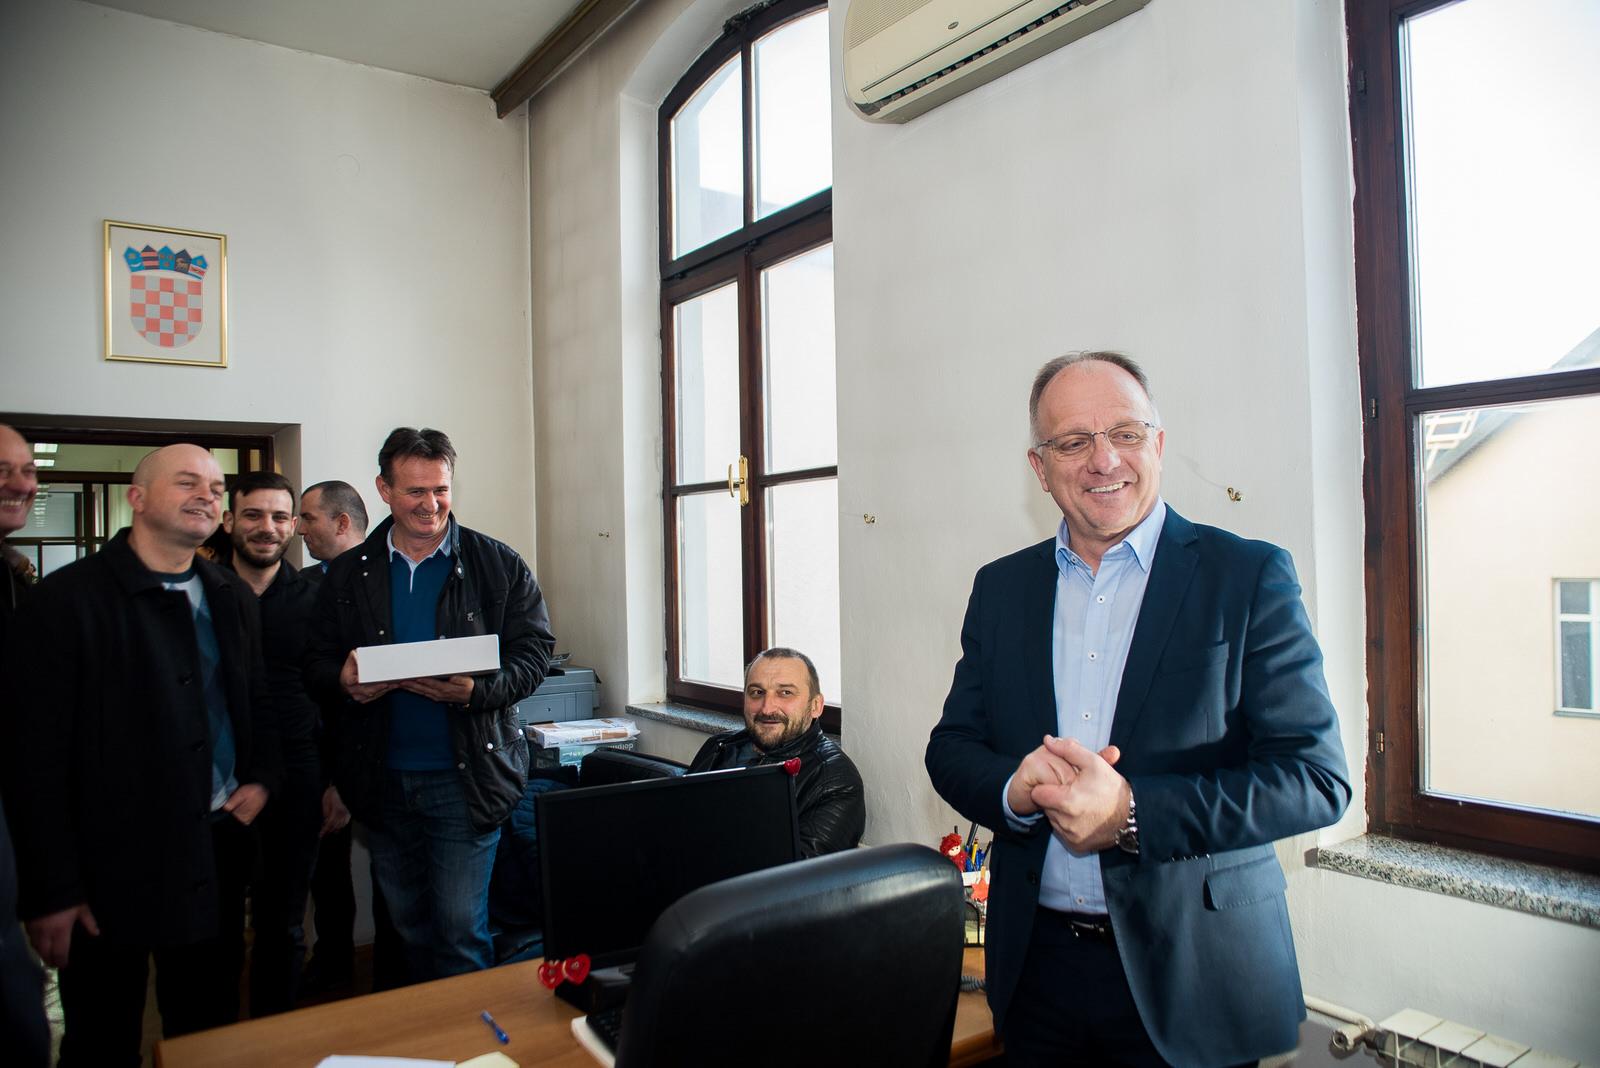 likaclub_politika-gospić_2019_bura-promjena-4